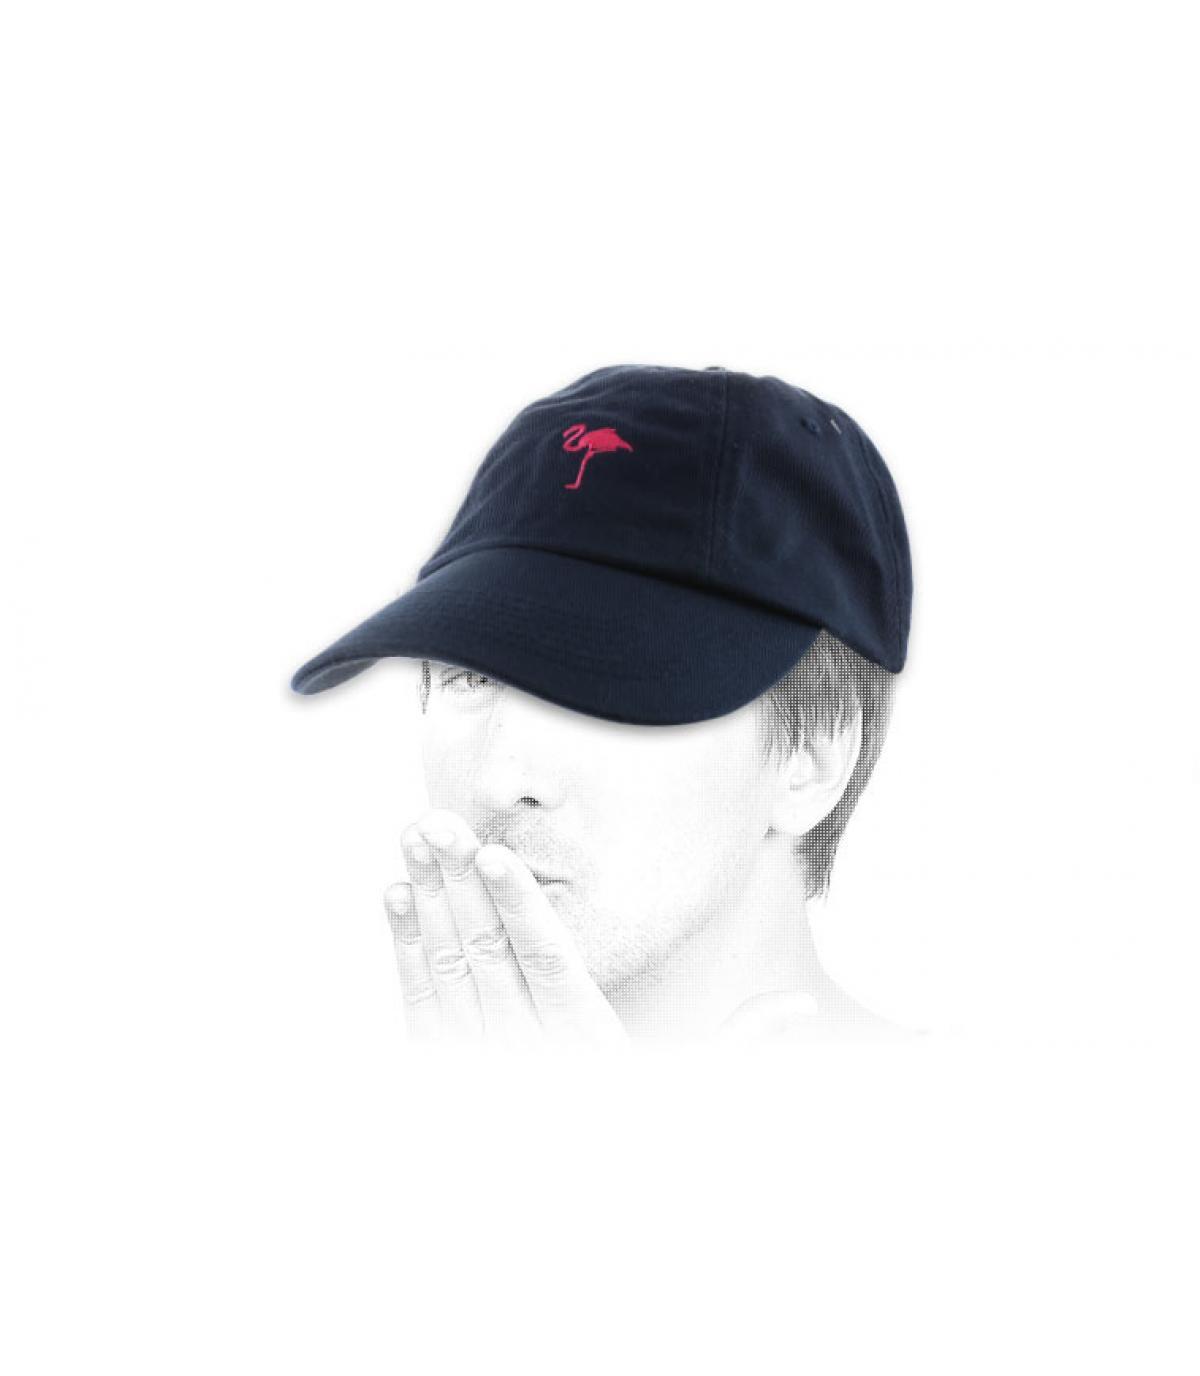 cappello fenicottero